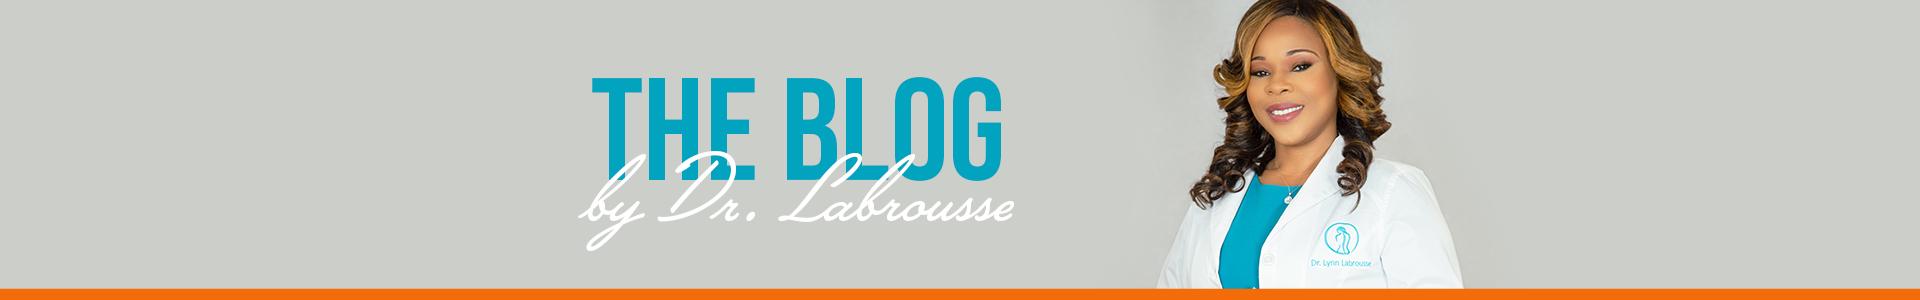 blog1-1920x300